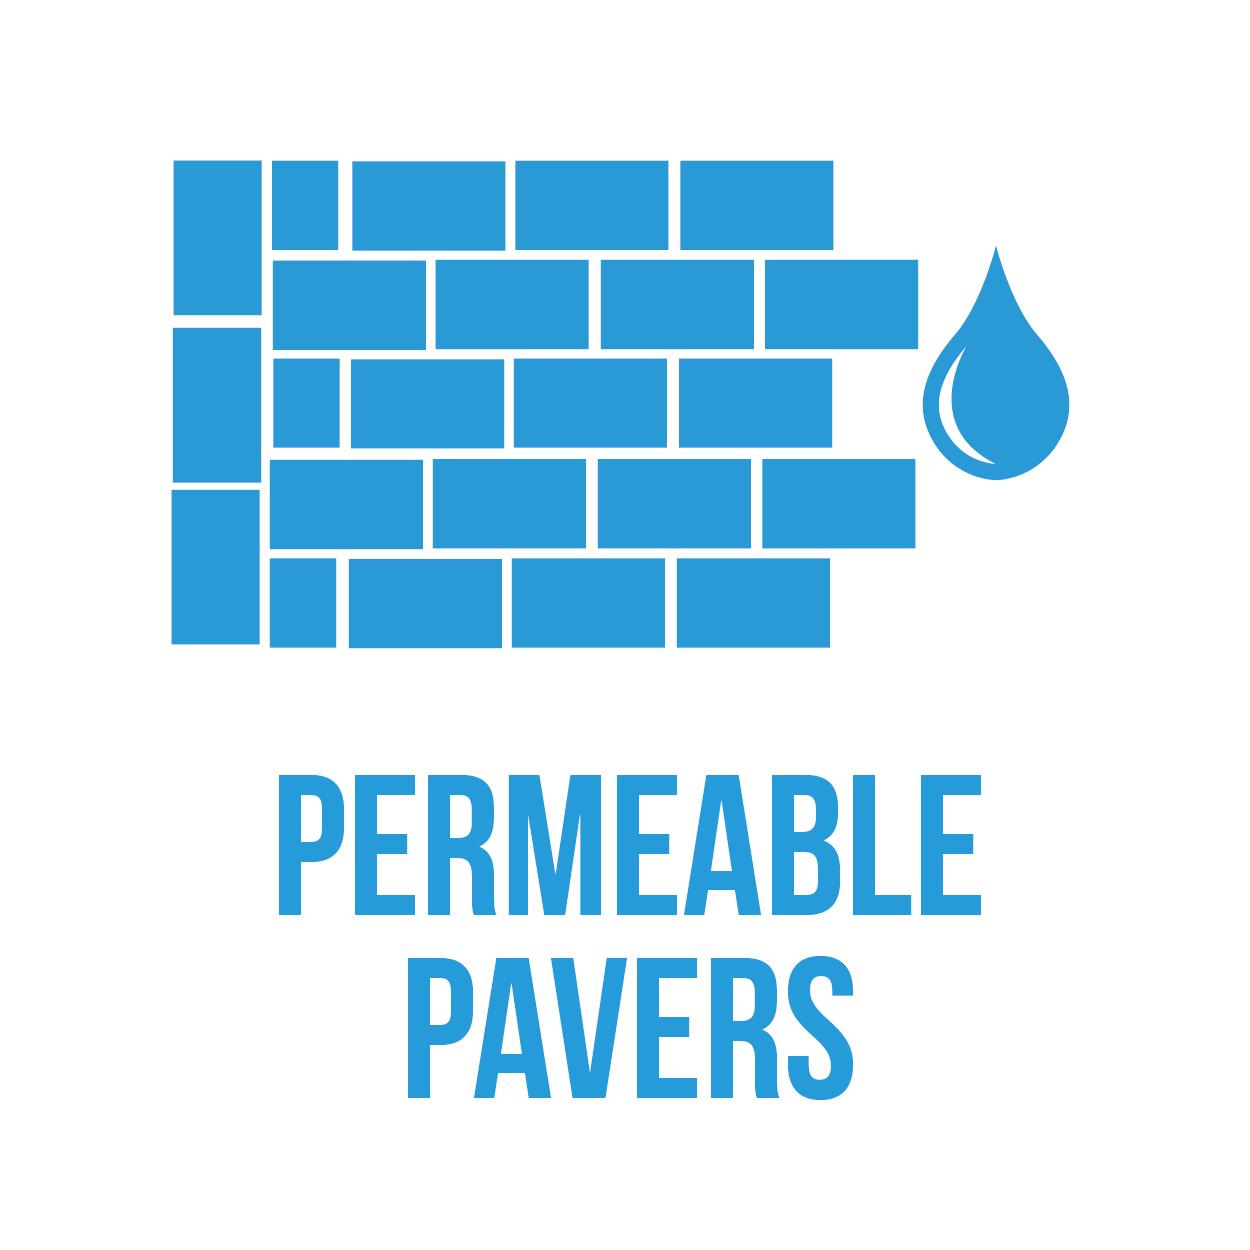 icon-permeablepavers-square.jpg